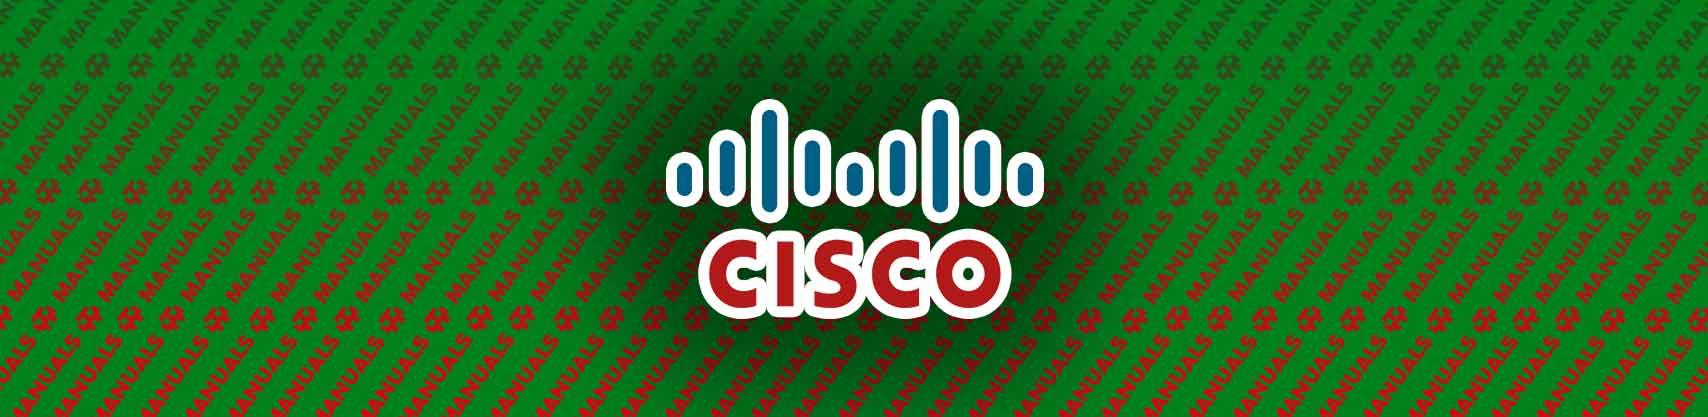 Cisco 4742HDC Manual